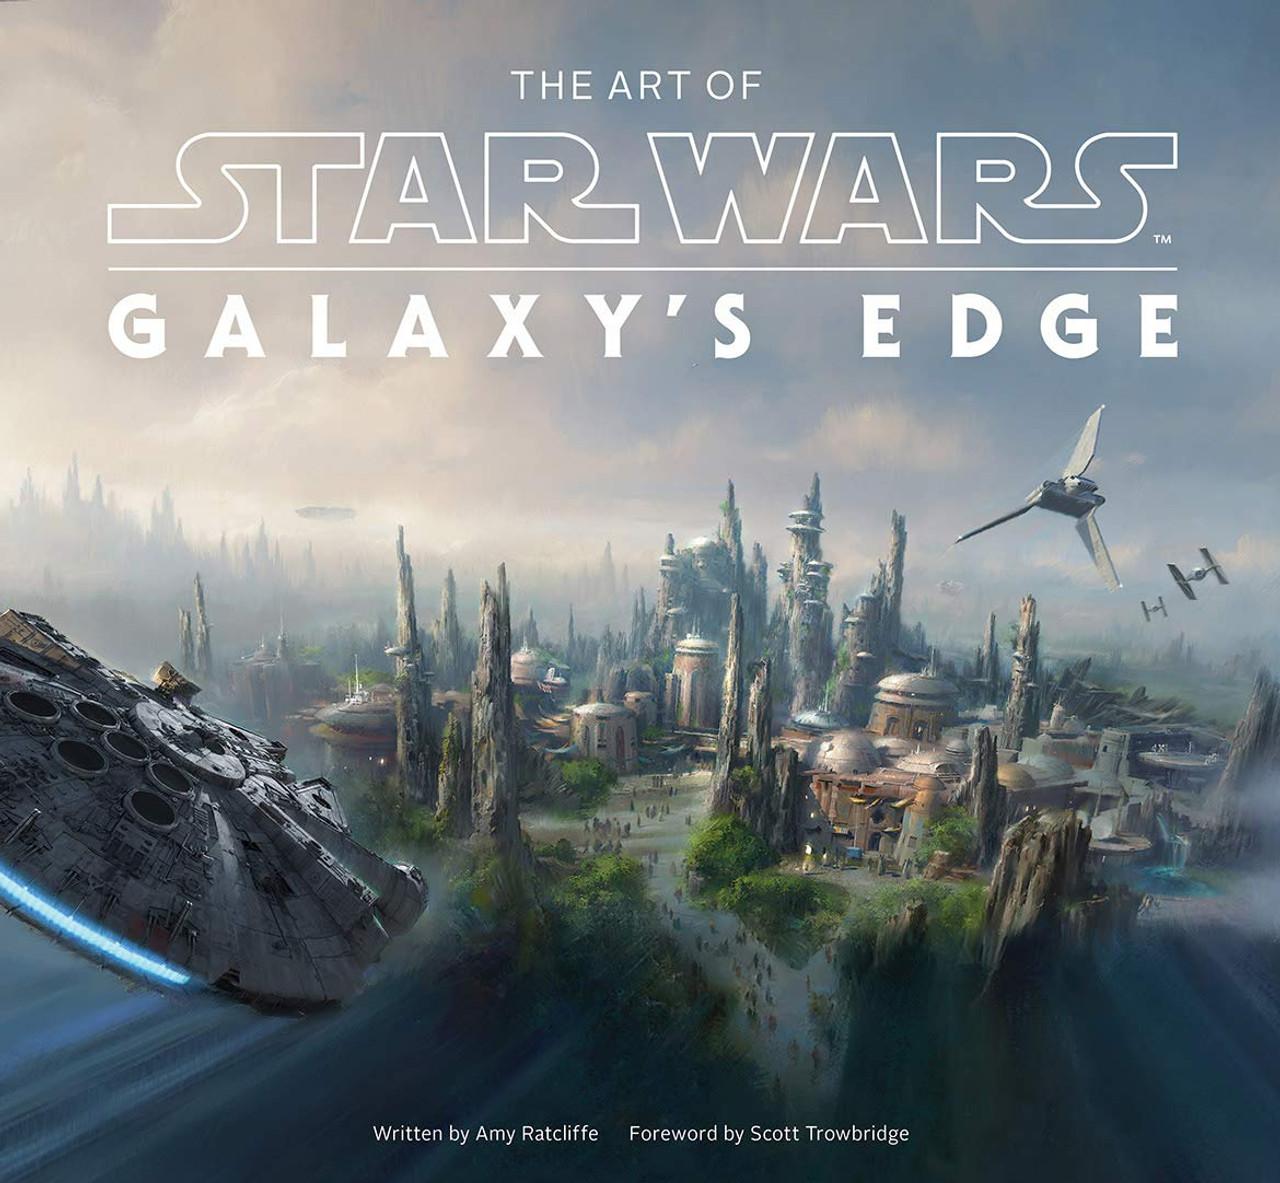 ART OF STAR WARS GALAXYS EDGE HC